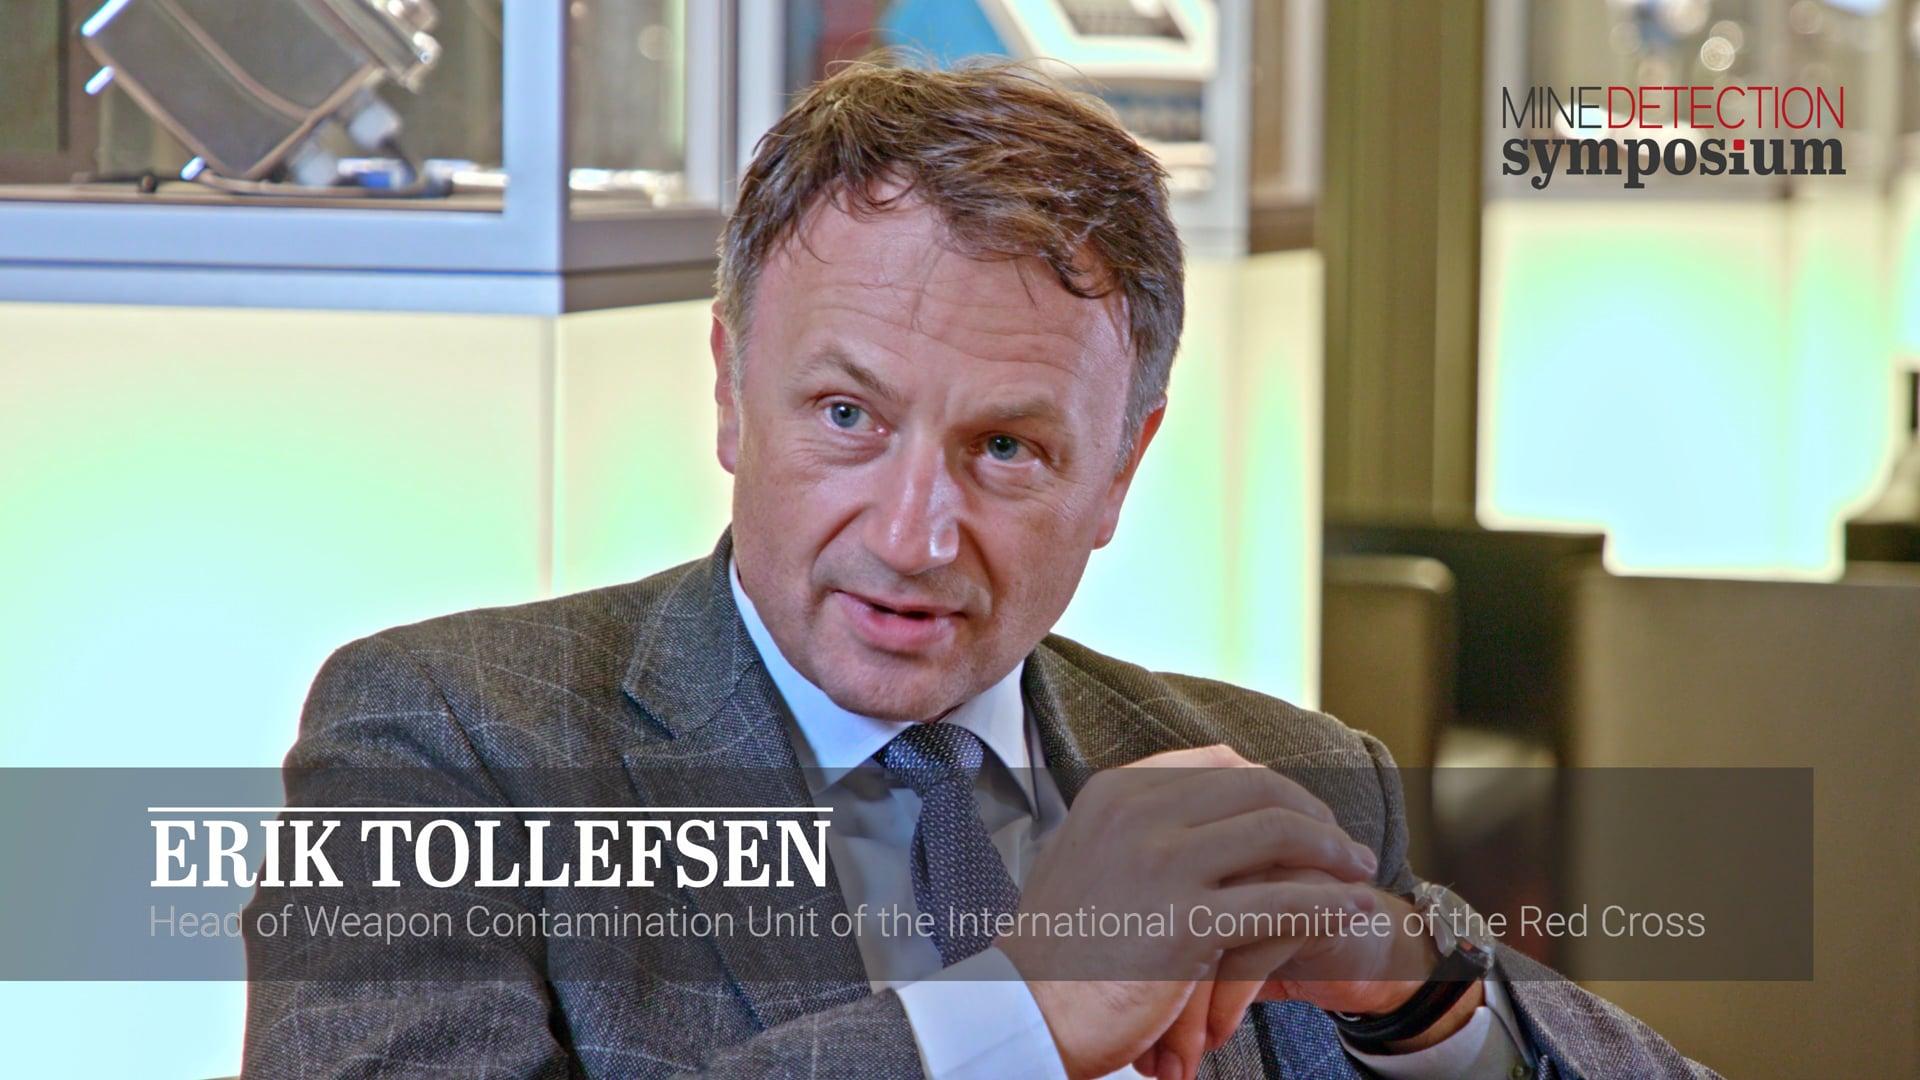 Erik Tollefsen - vision - Mine Detection Symposium 2019